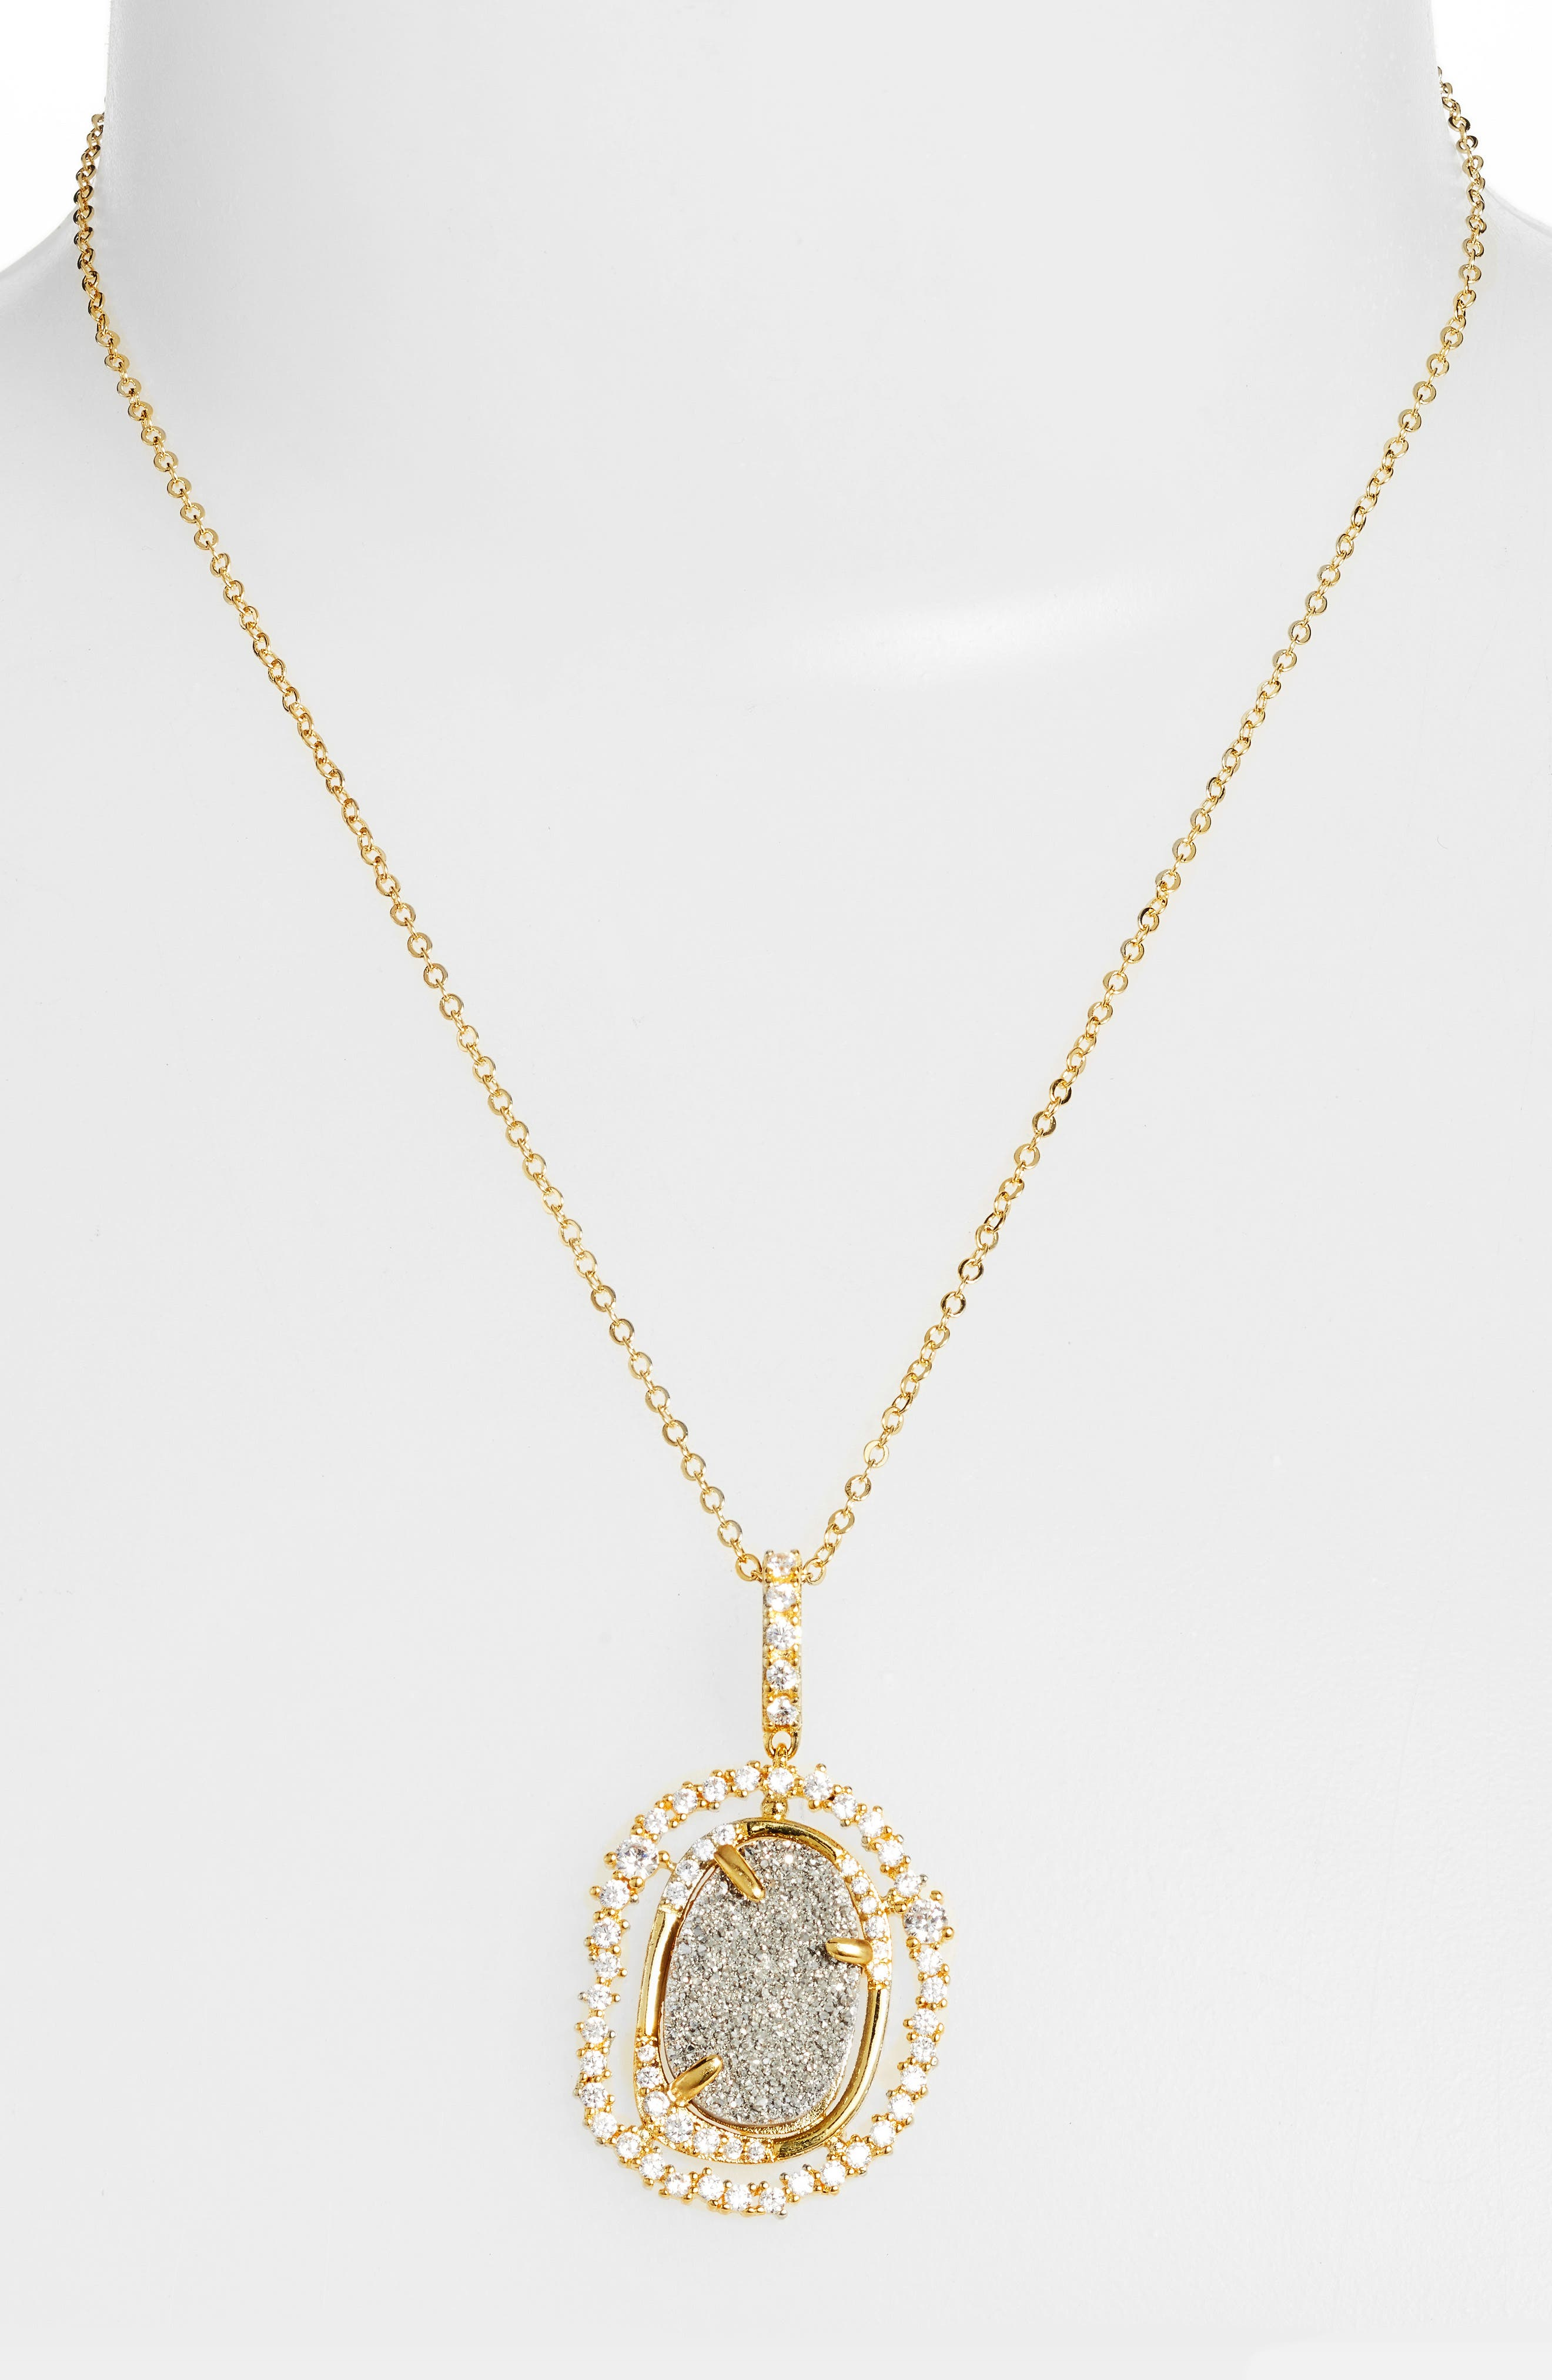 Loriann Pendant Necklace,                             Main thumbnail 1, color,                             Grey Druzy/ Gold